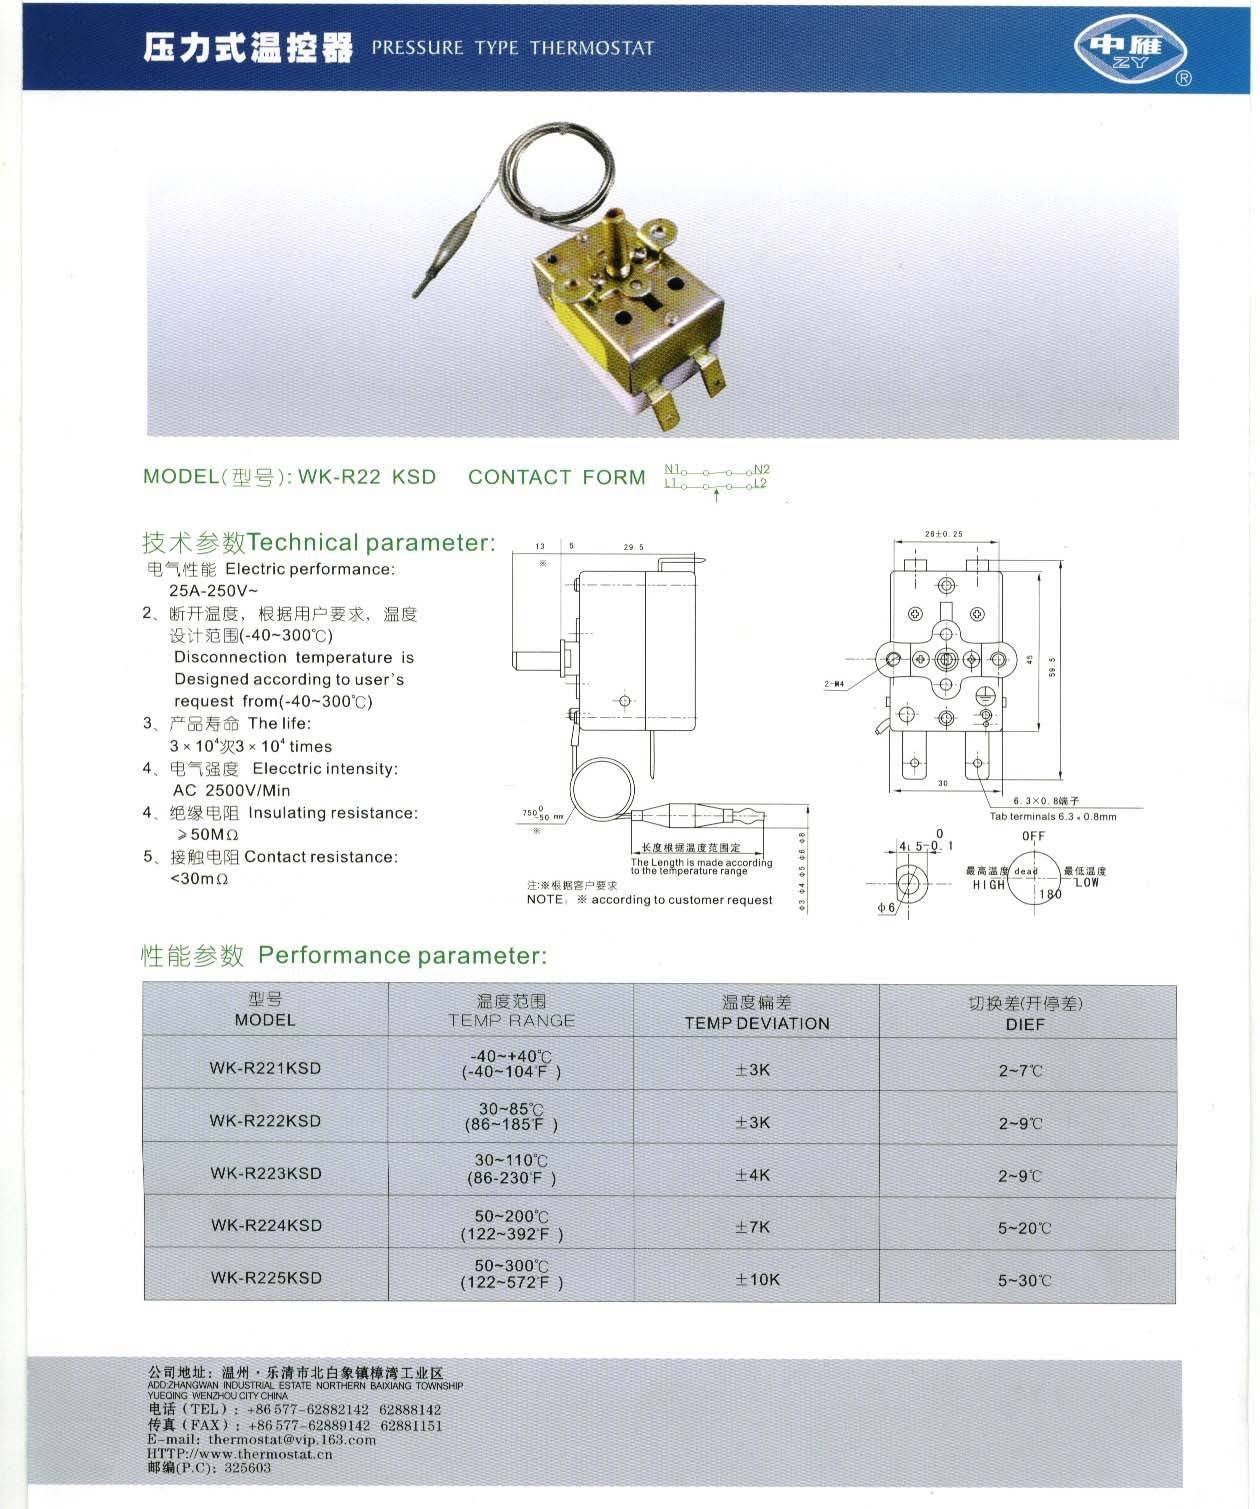 thermostat WK-R22 KSD